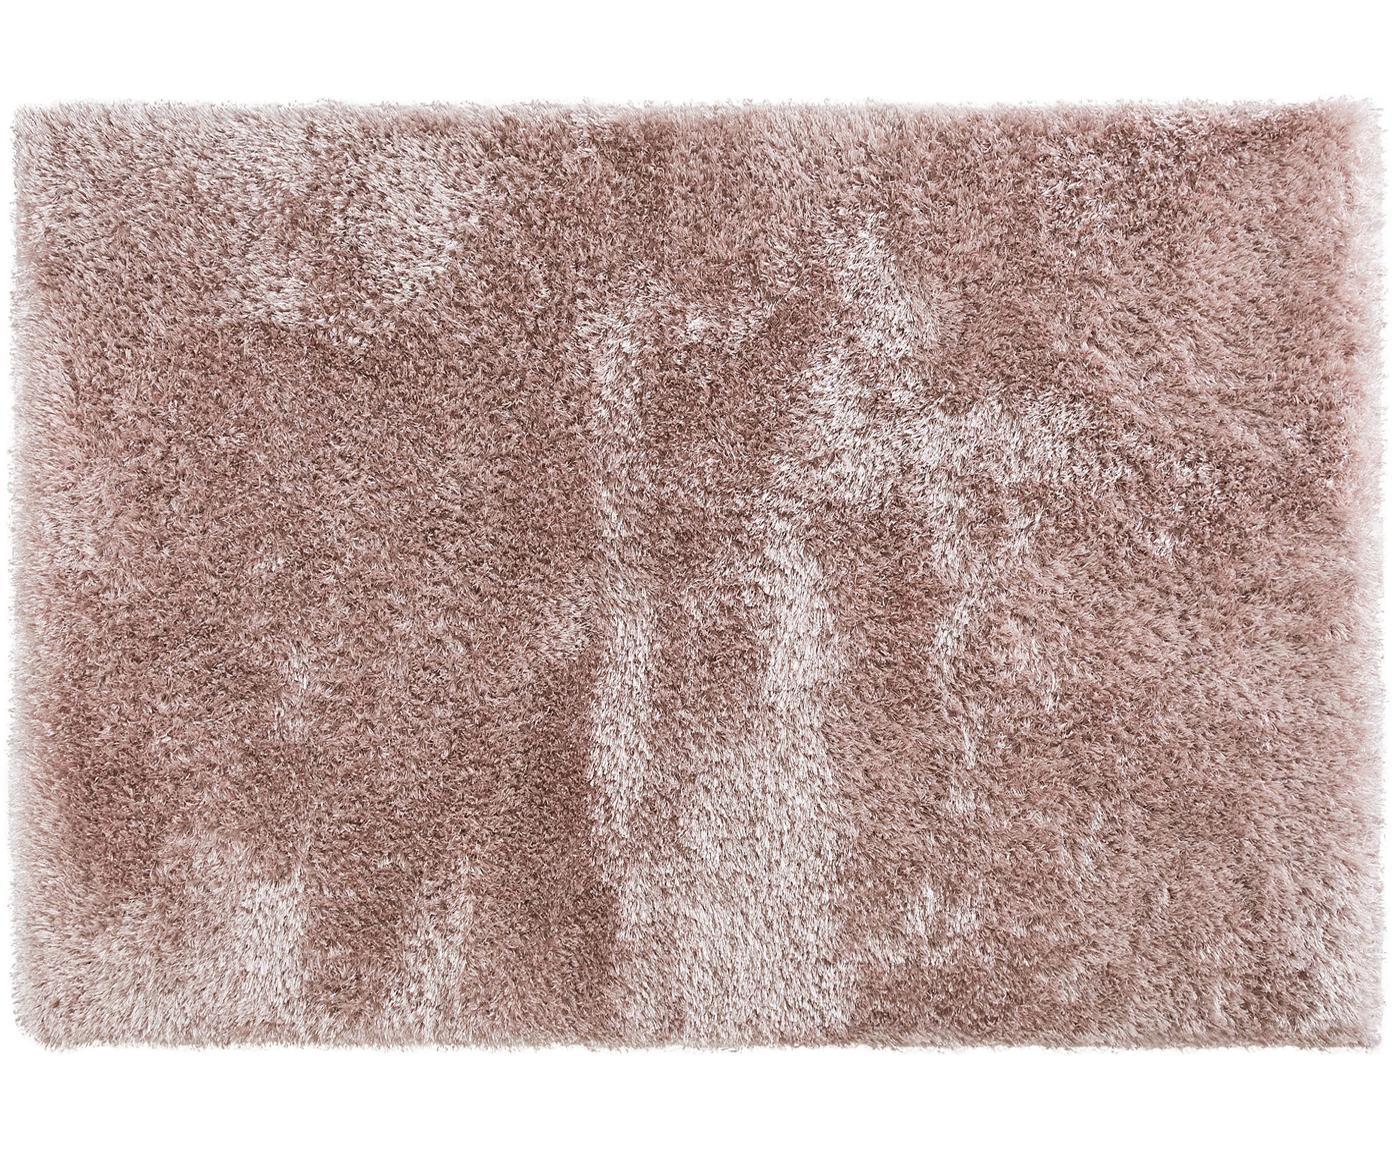 Glanzend hoogpolig vloerkleed Lea, 50% polyester, 50% polypropyleen, Roze, B 140 x L 200 cm (maat S)